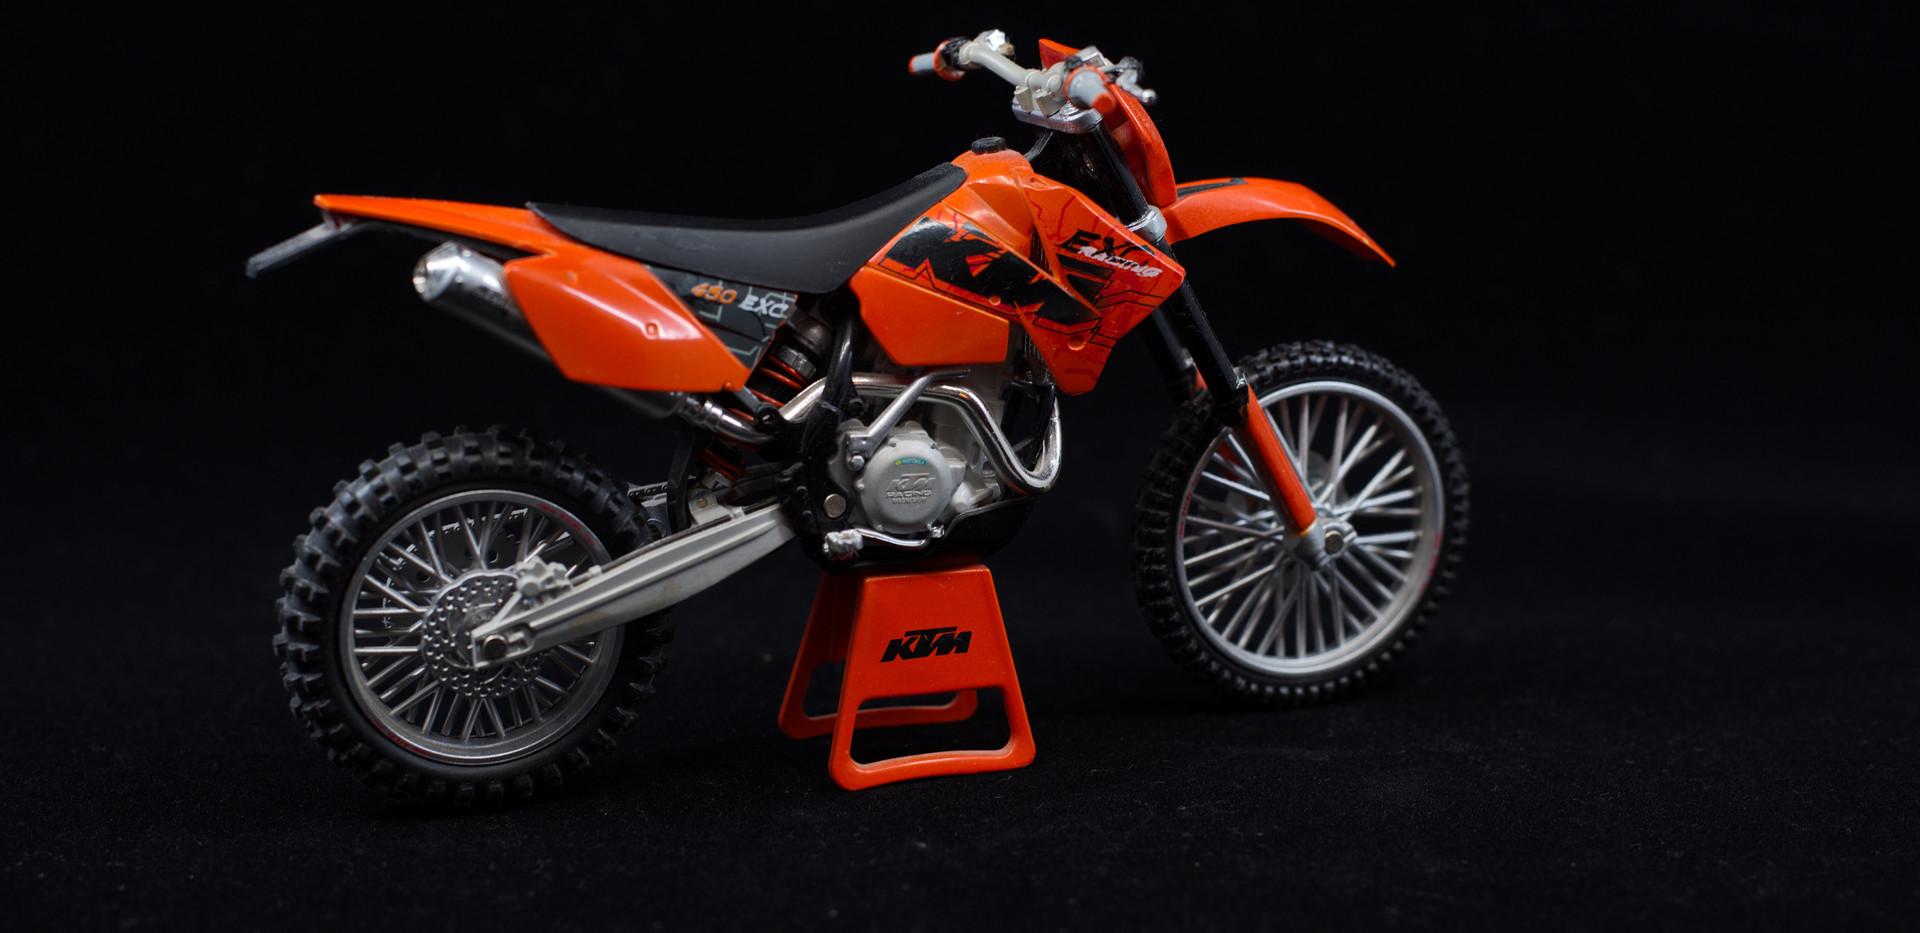 KTM Dirt Bike